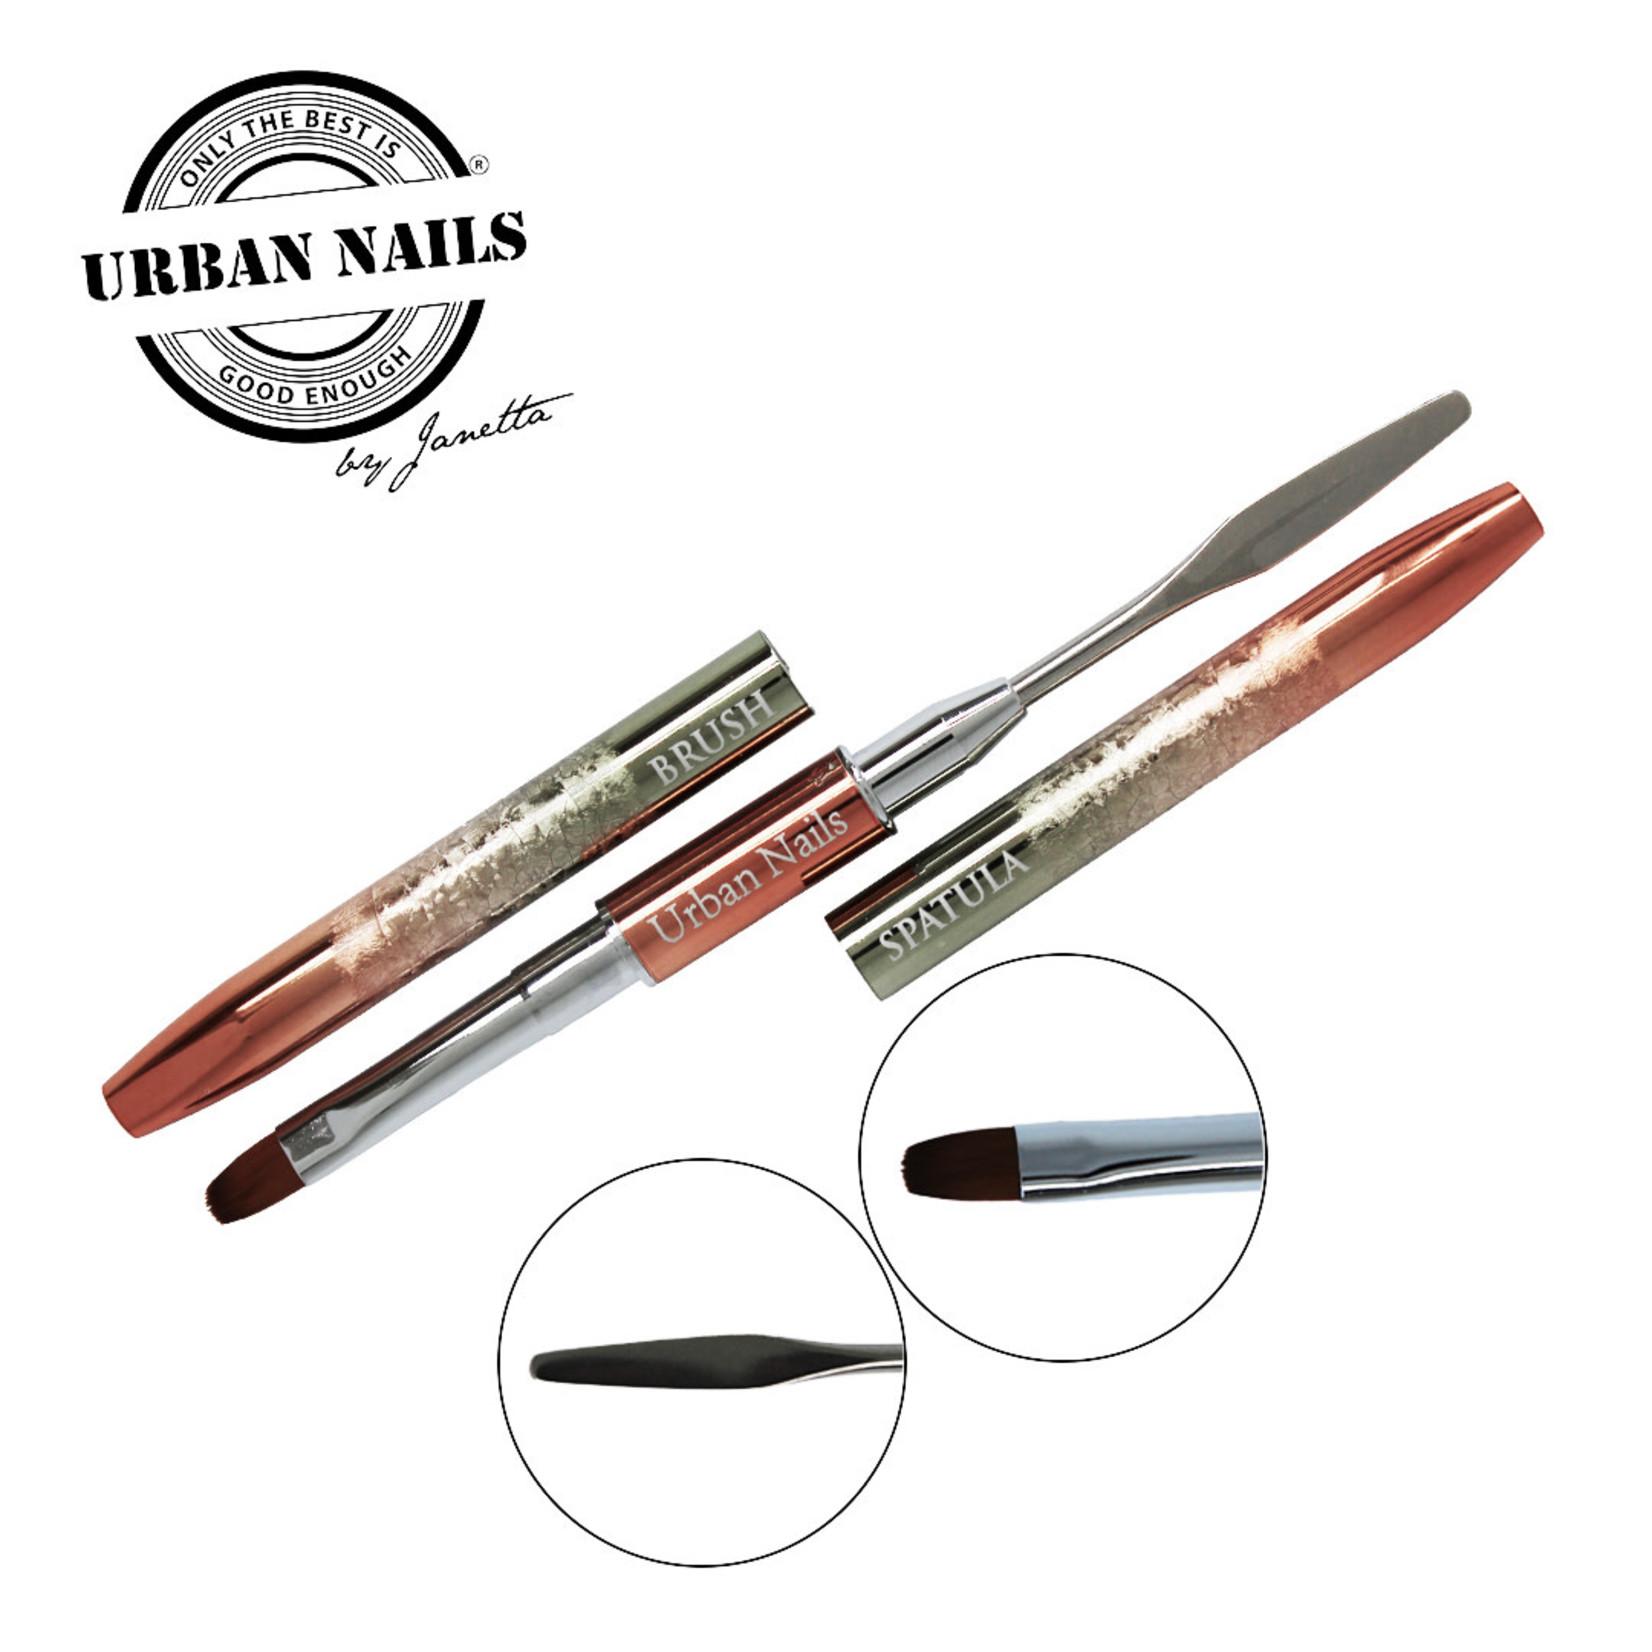 Urban Nails Rosegold Spatula Double Brush